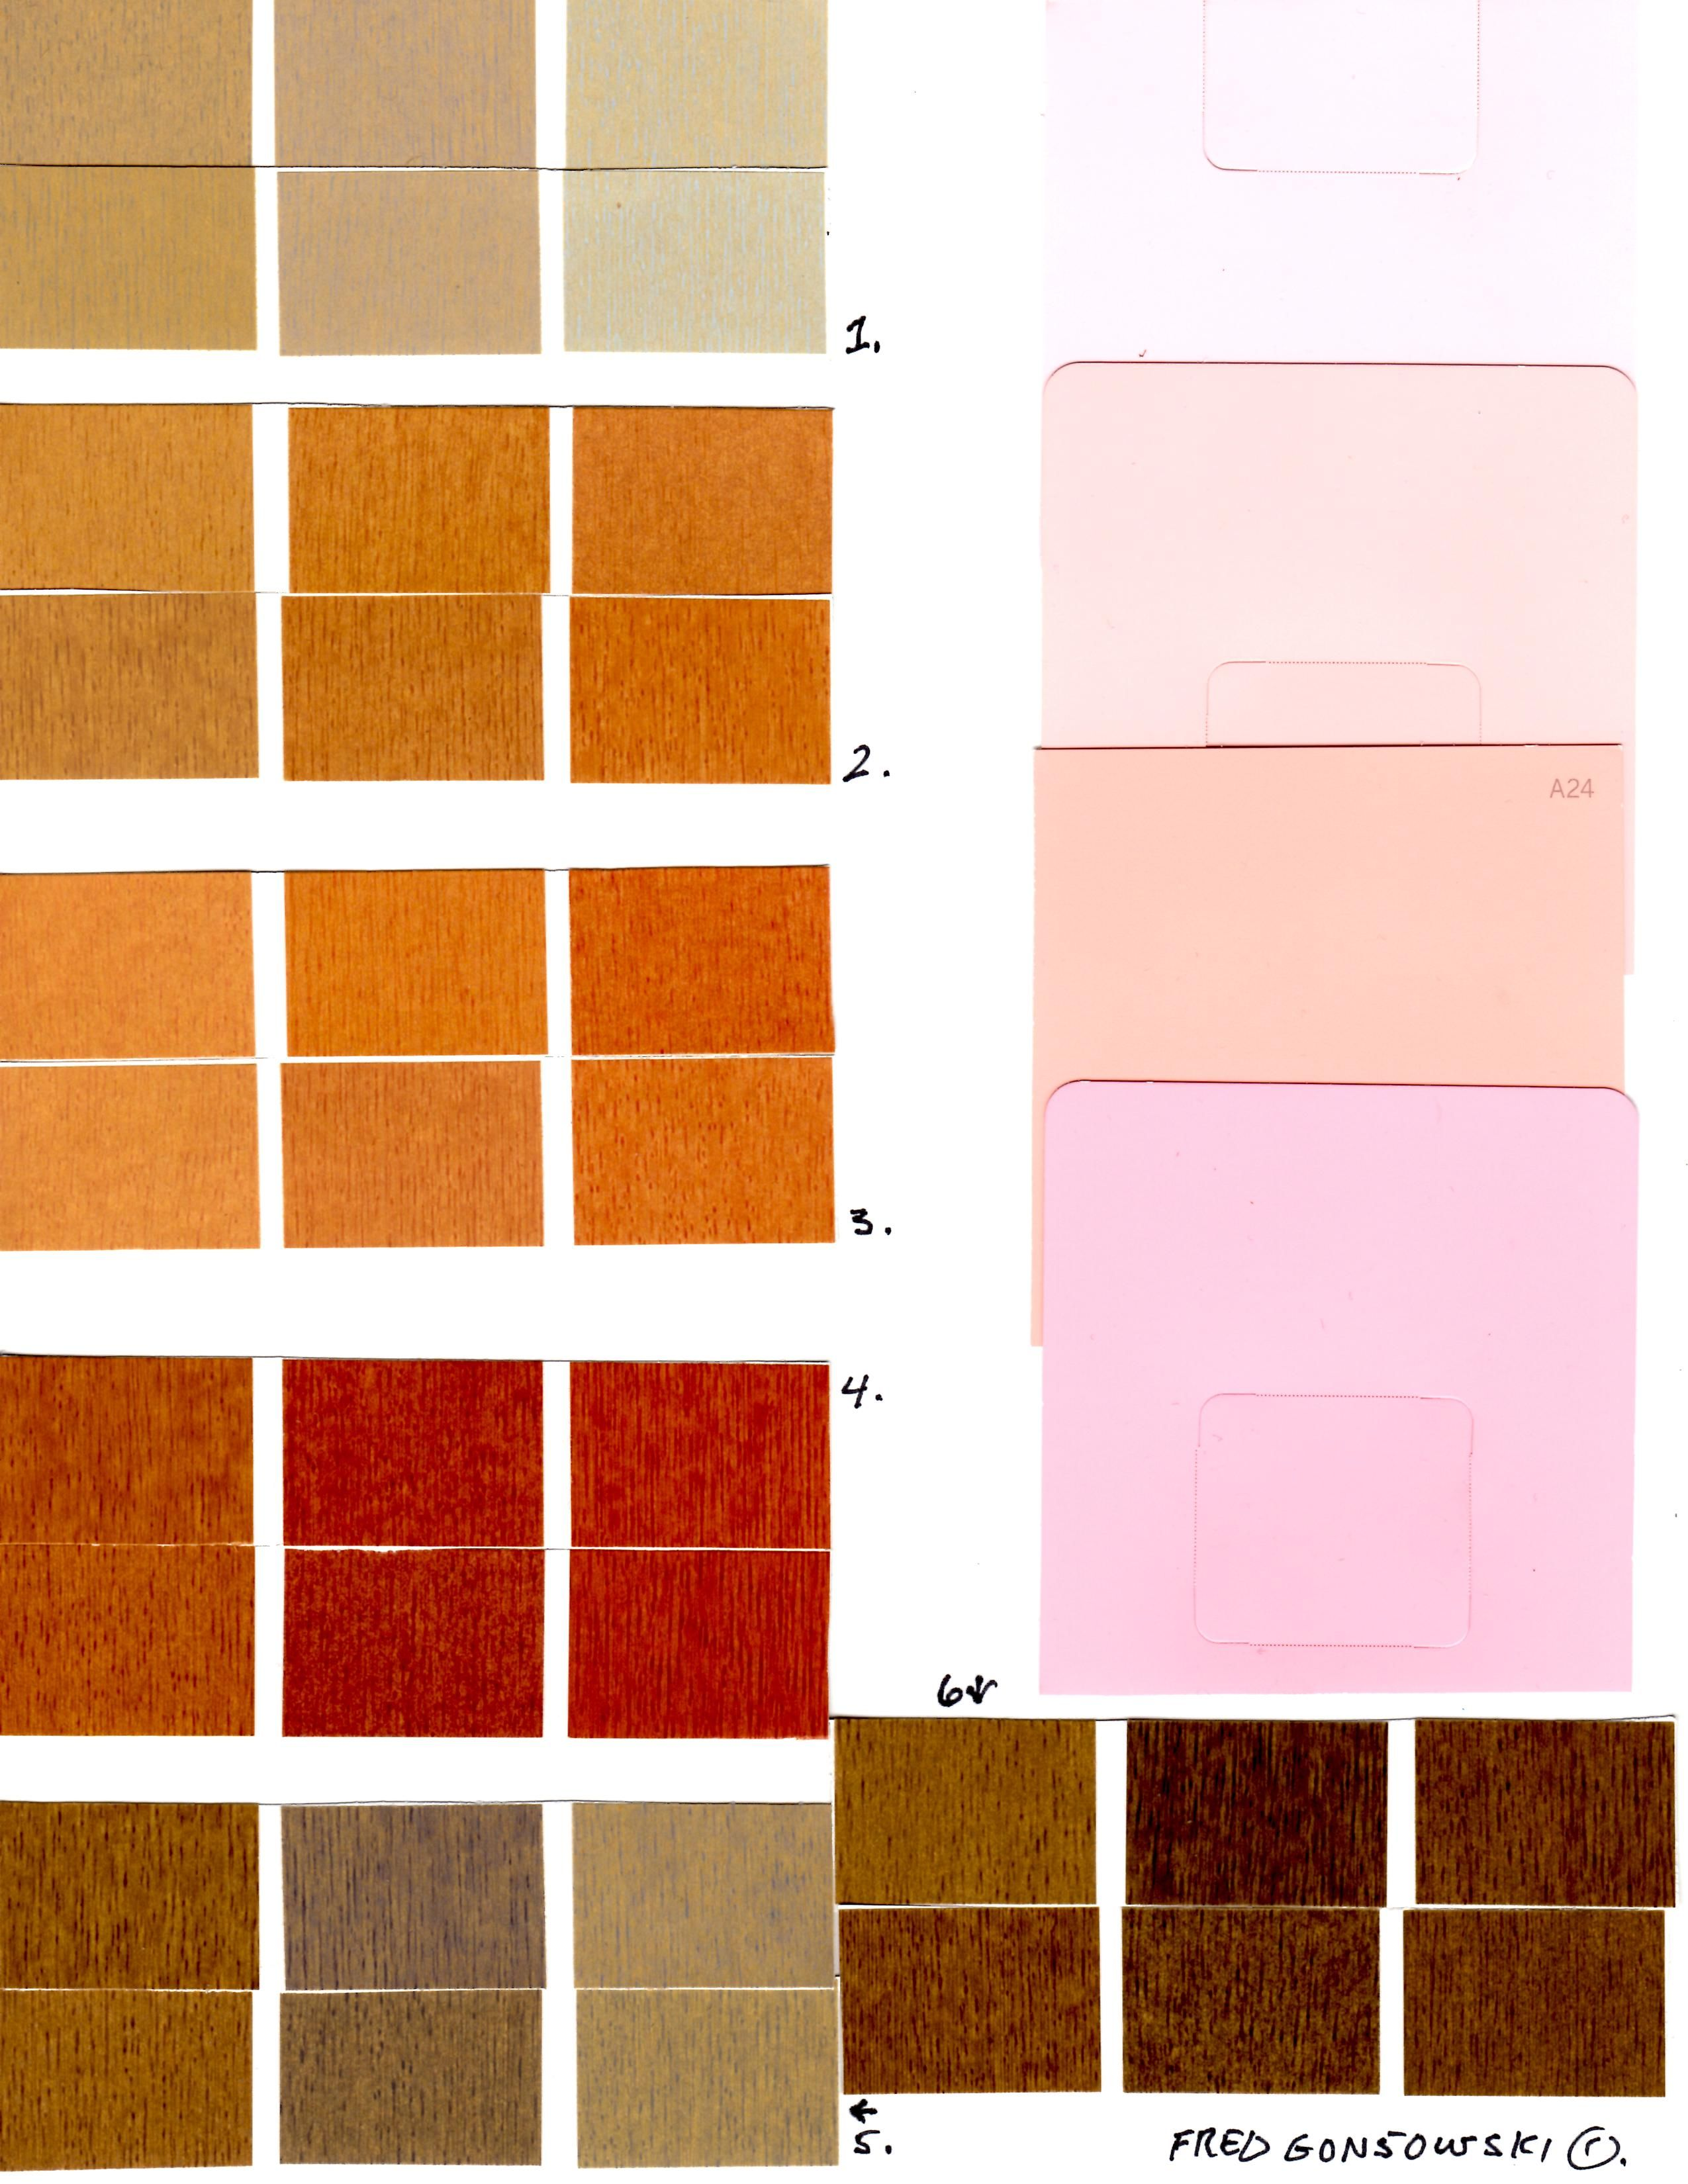 Shades Of Orange Color Paint Google Search Paint Colors House Colors Colorful Furniture